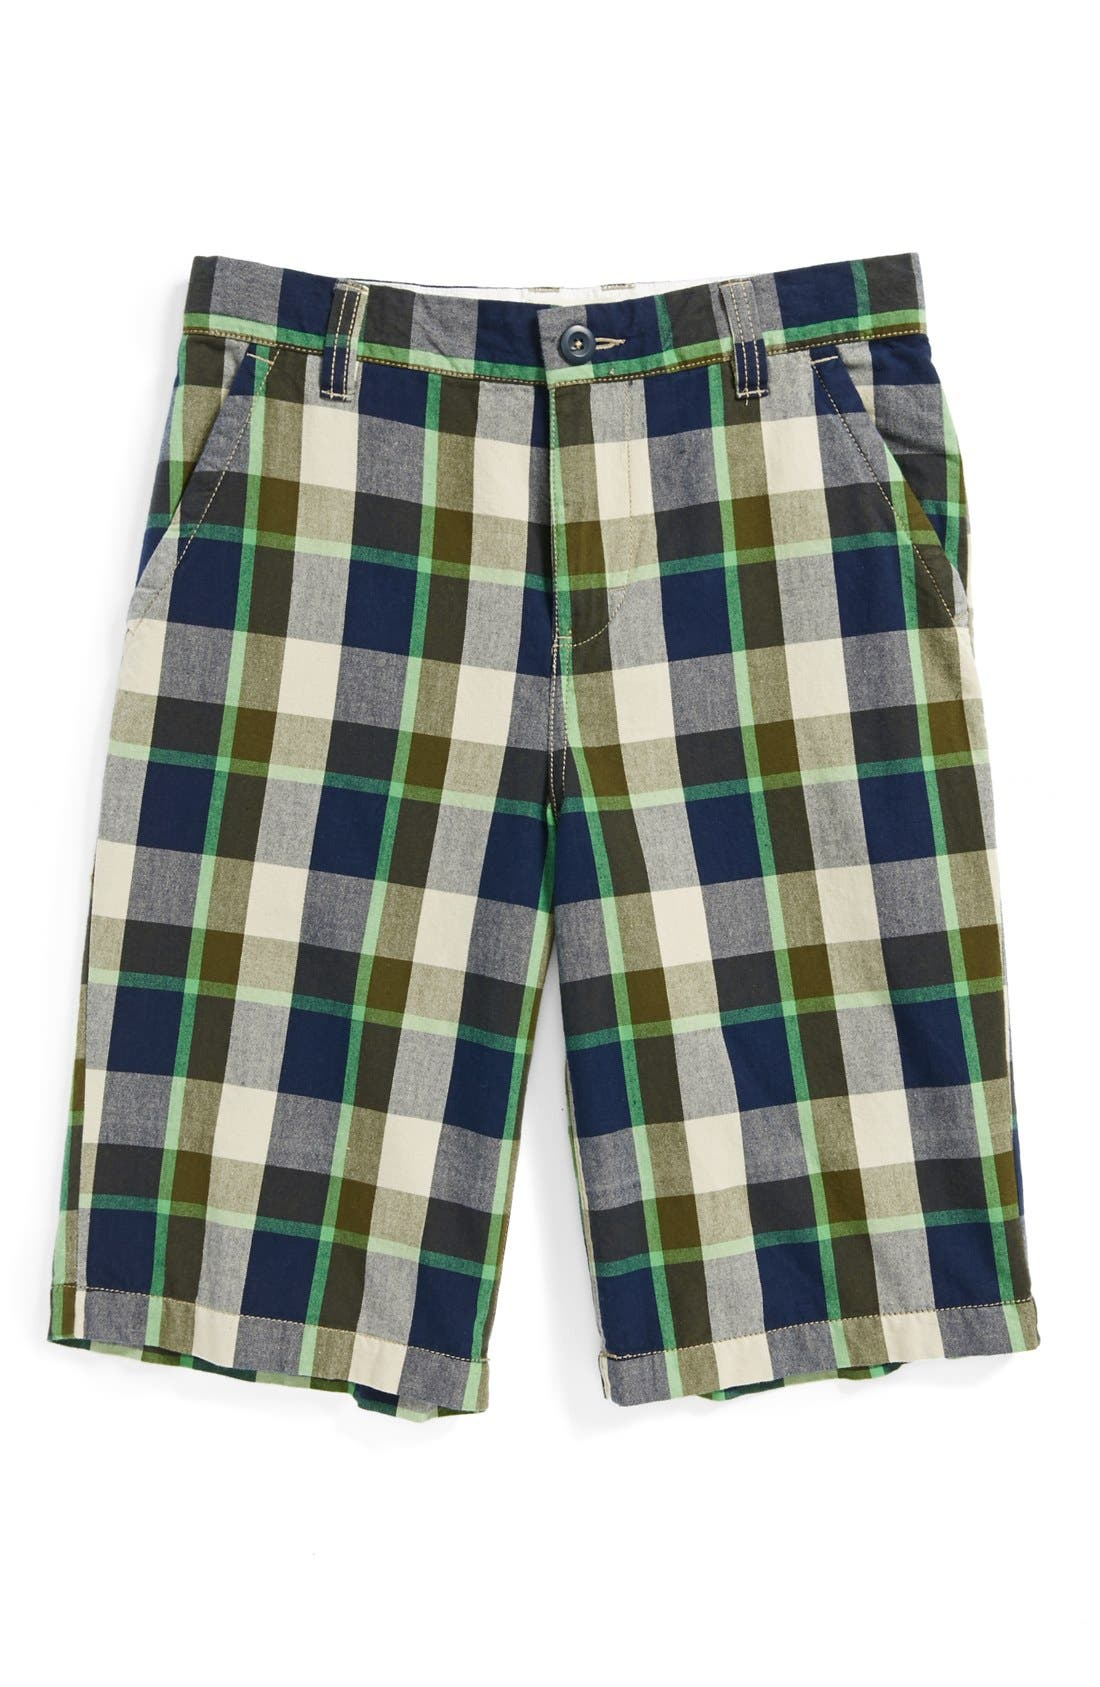 Alternate Image 1 Selected - Tucker + Tate 'Arthur' Shorts (Big Boys)